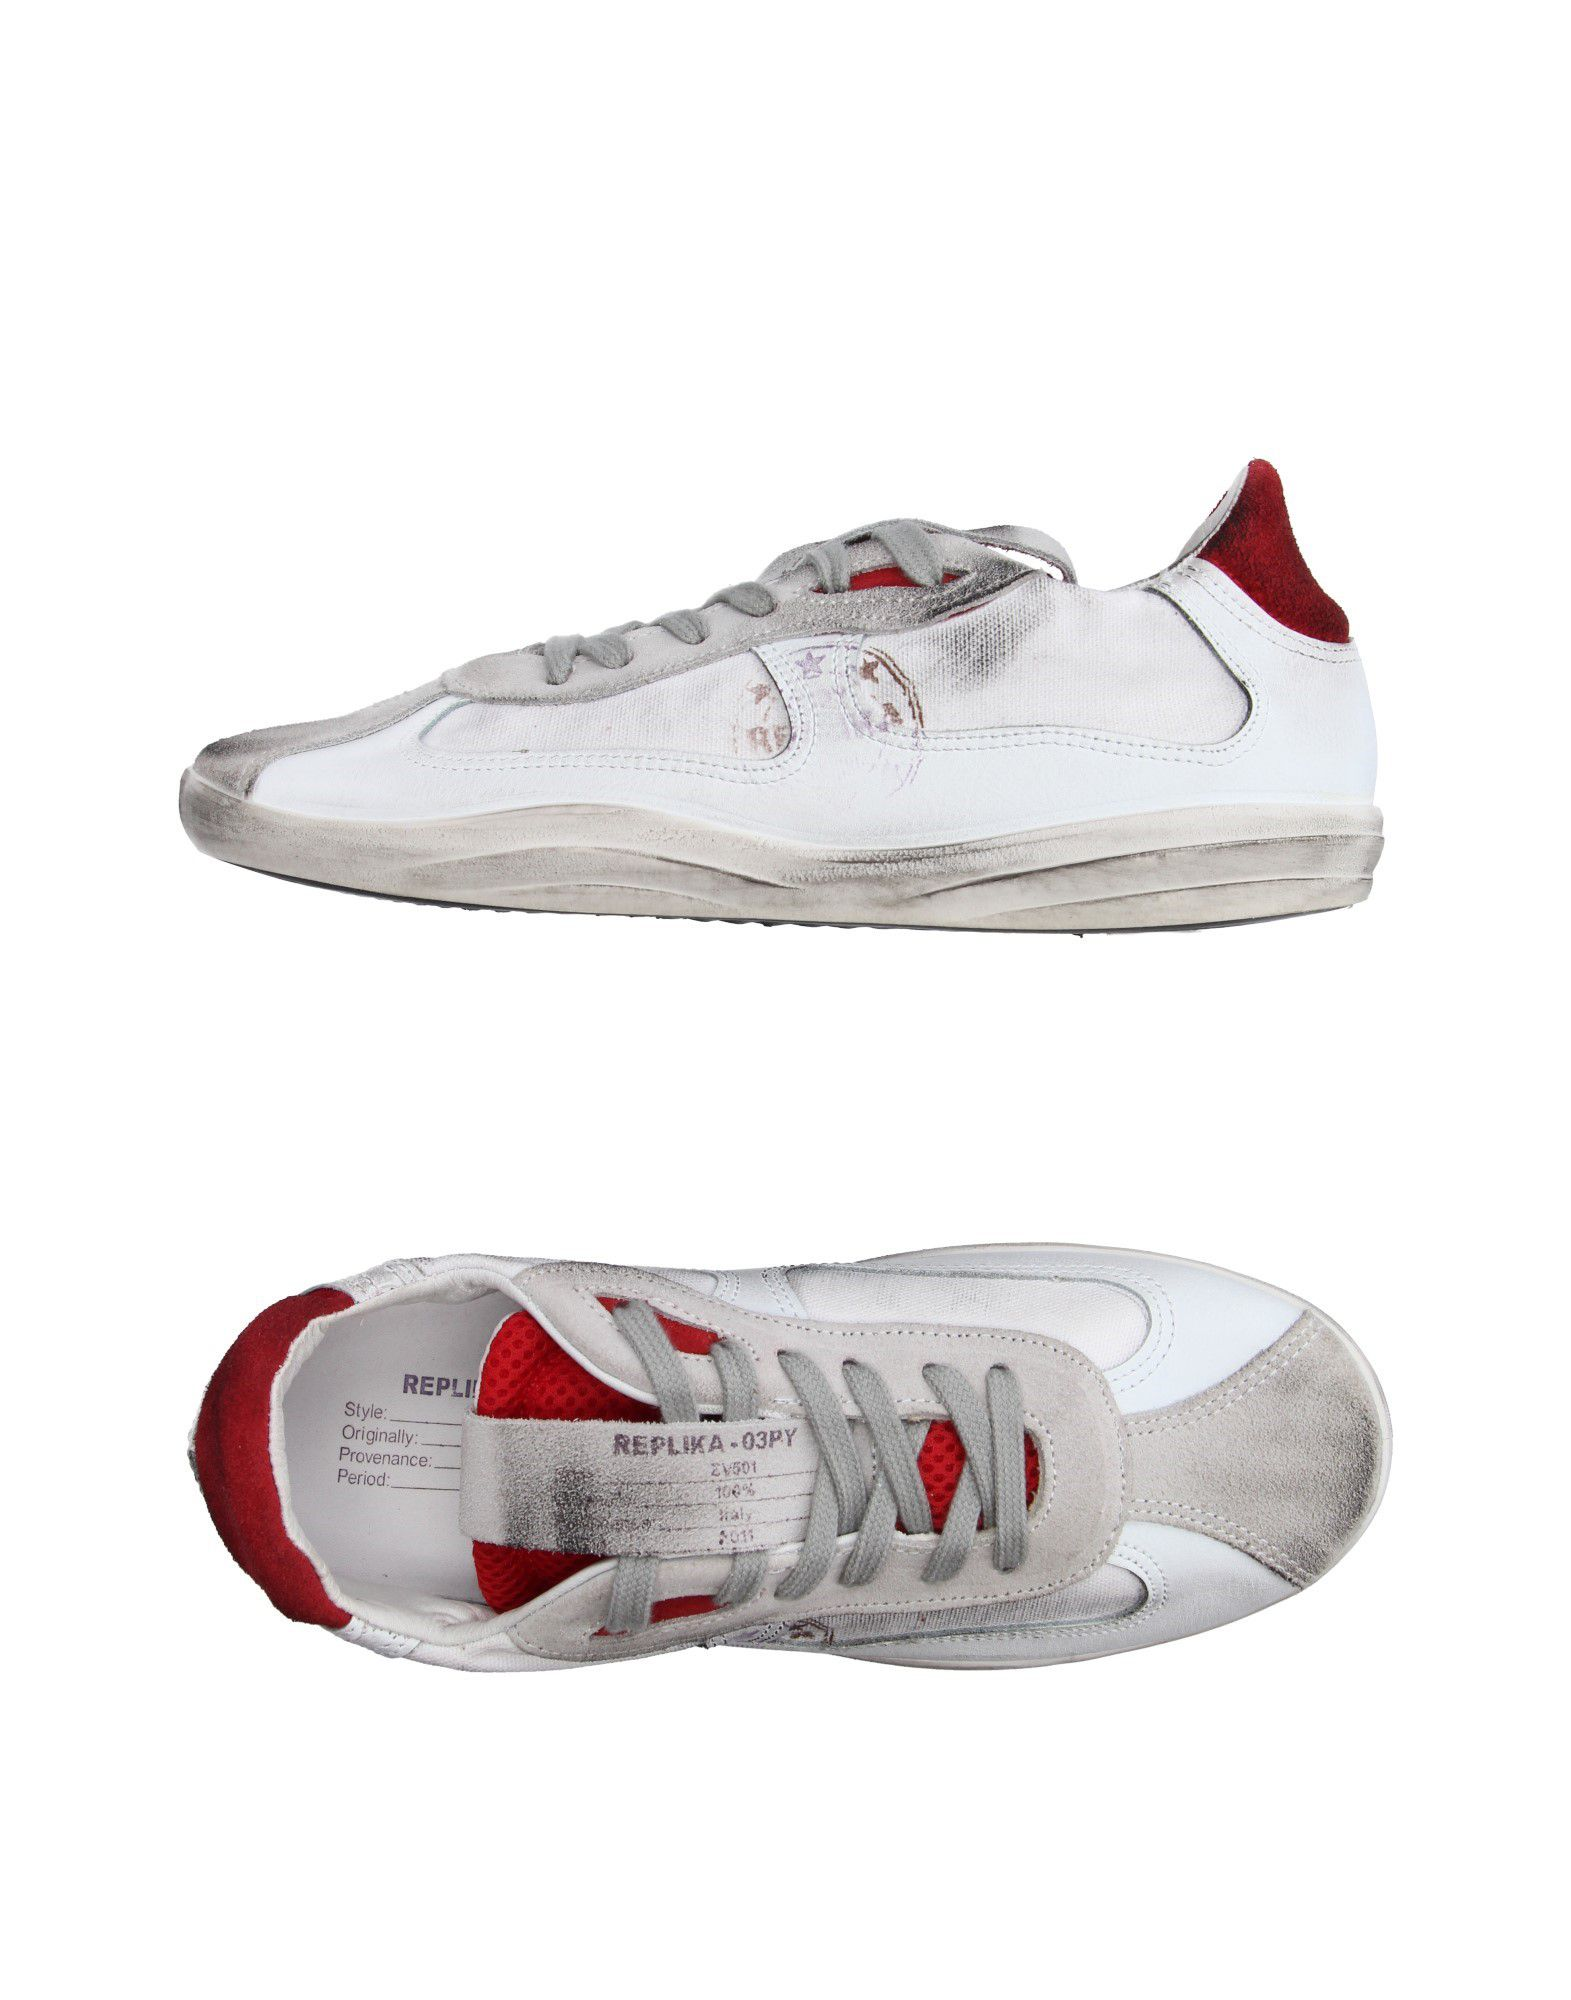 Sneakers Replika-03Py Femme - Sneakers Replika-03Py sur